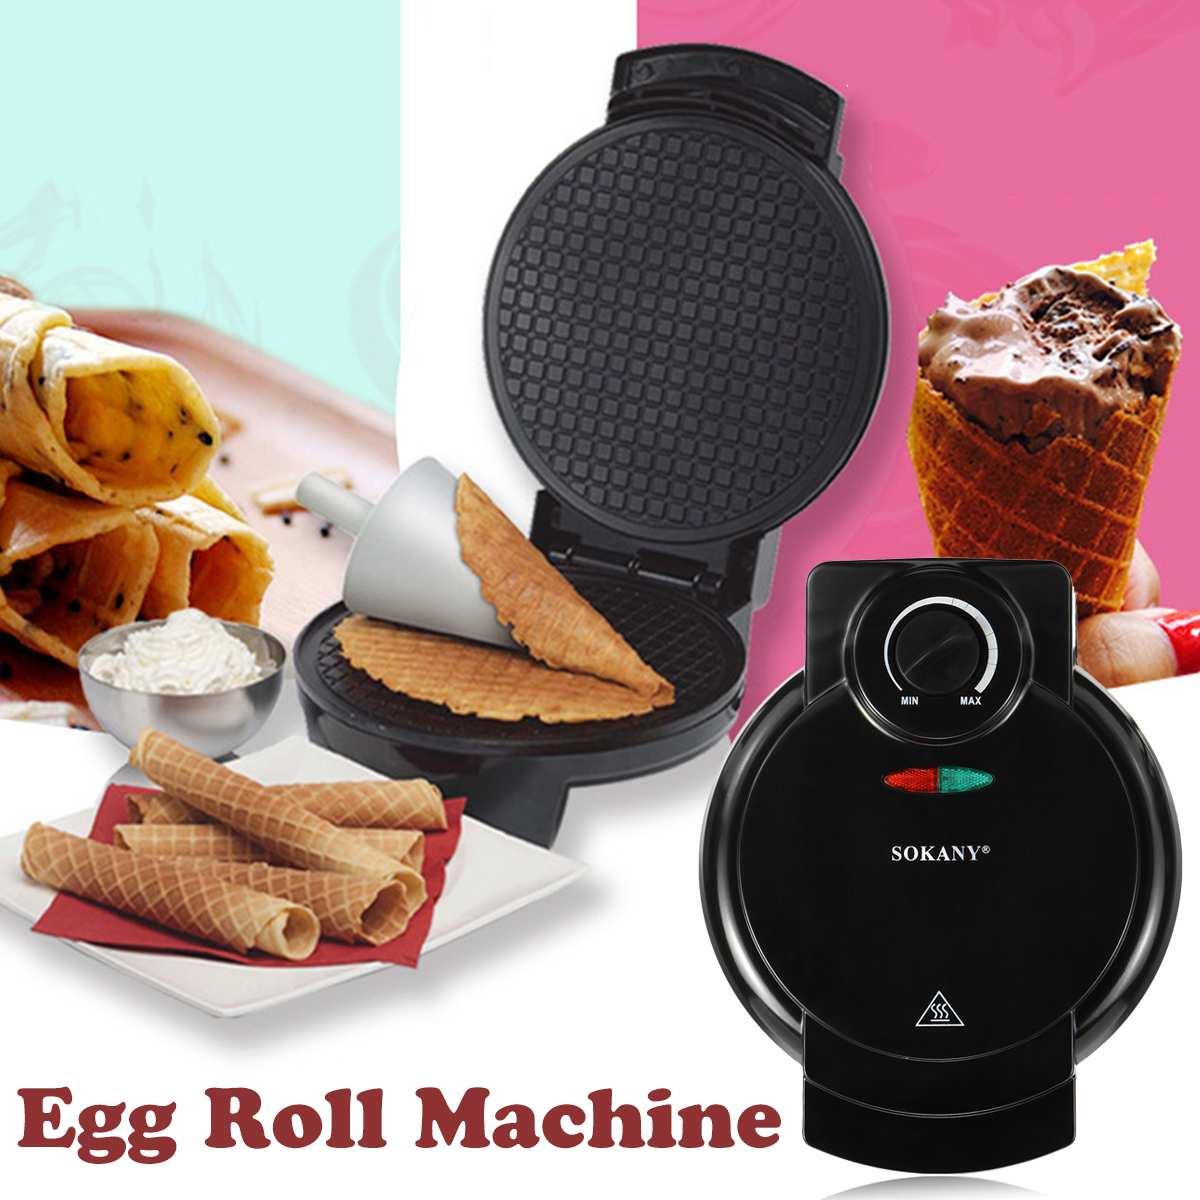 Electric Eggs Roll Maker LED Crispy Omelet Non-Stick Baking DIY  Ice Cream Crust Pancake Machine Automatic Temperature Control недорого